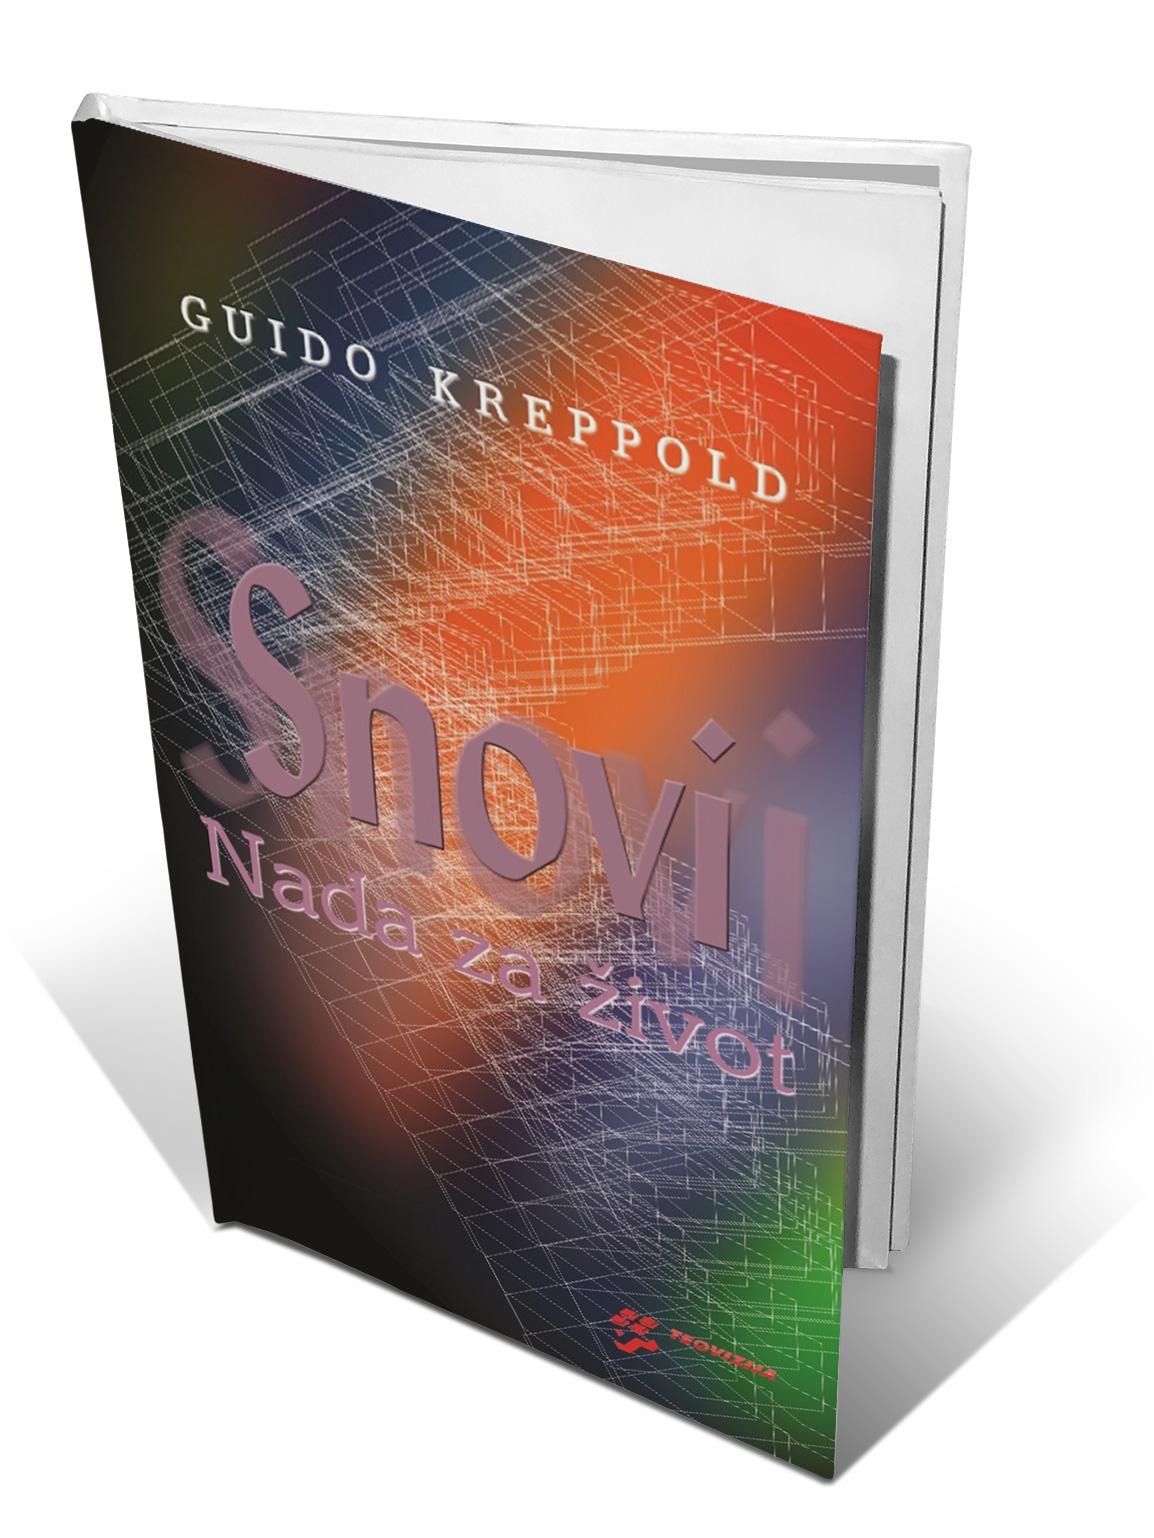 SNOVI - NADA ZA ŽIVOT - Guido Kreppold